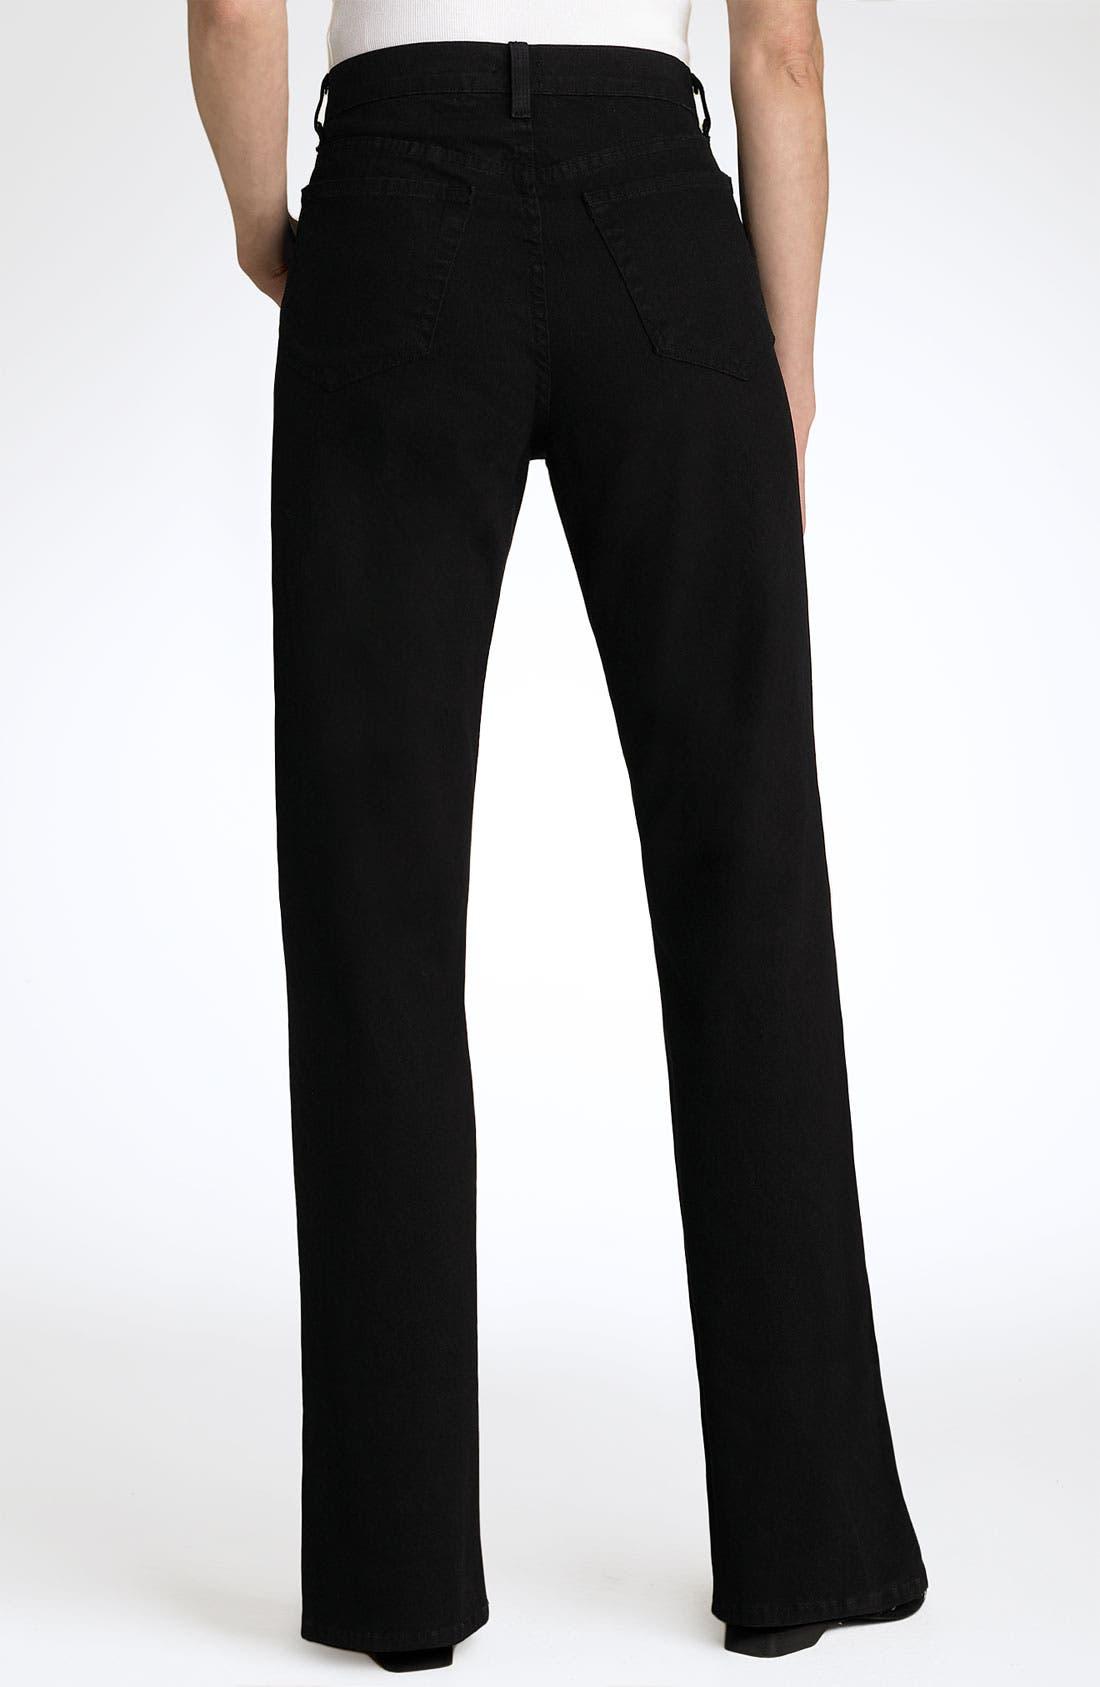 Alternate Image 2  - NYDJ 'Sarah' Stretch Bootcut Jeans (Regular & Petite)